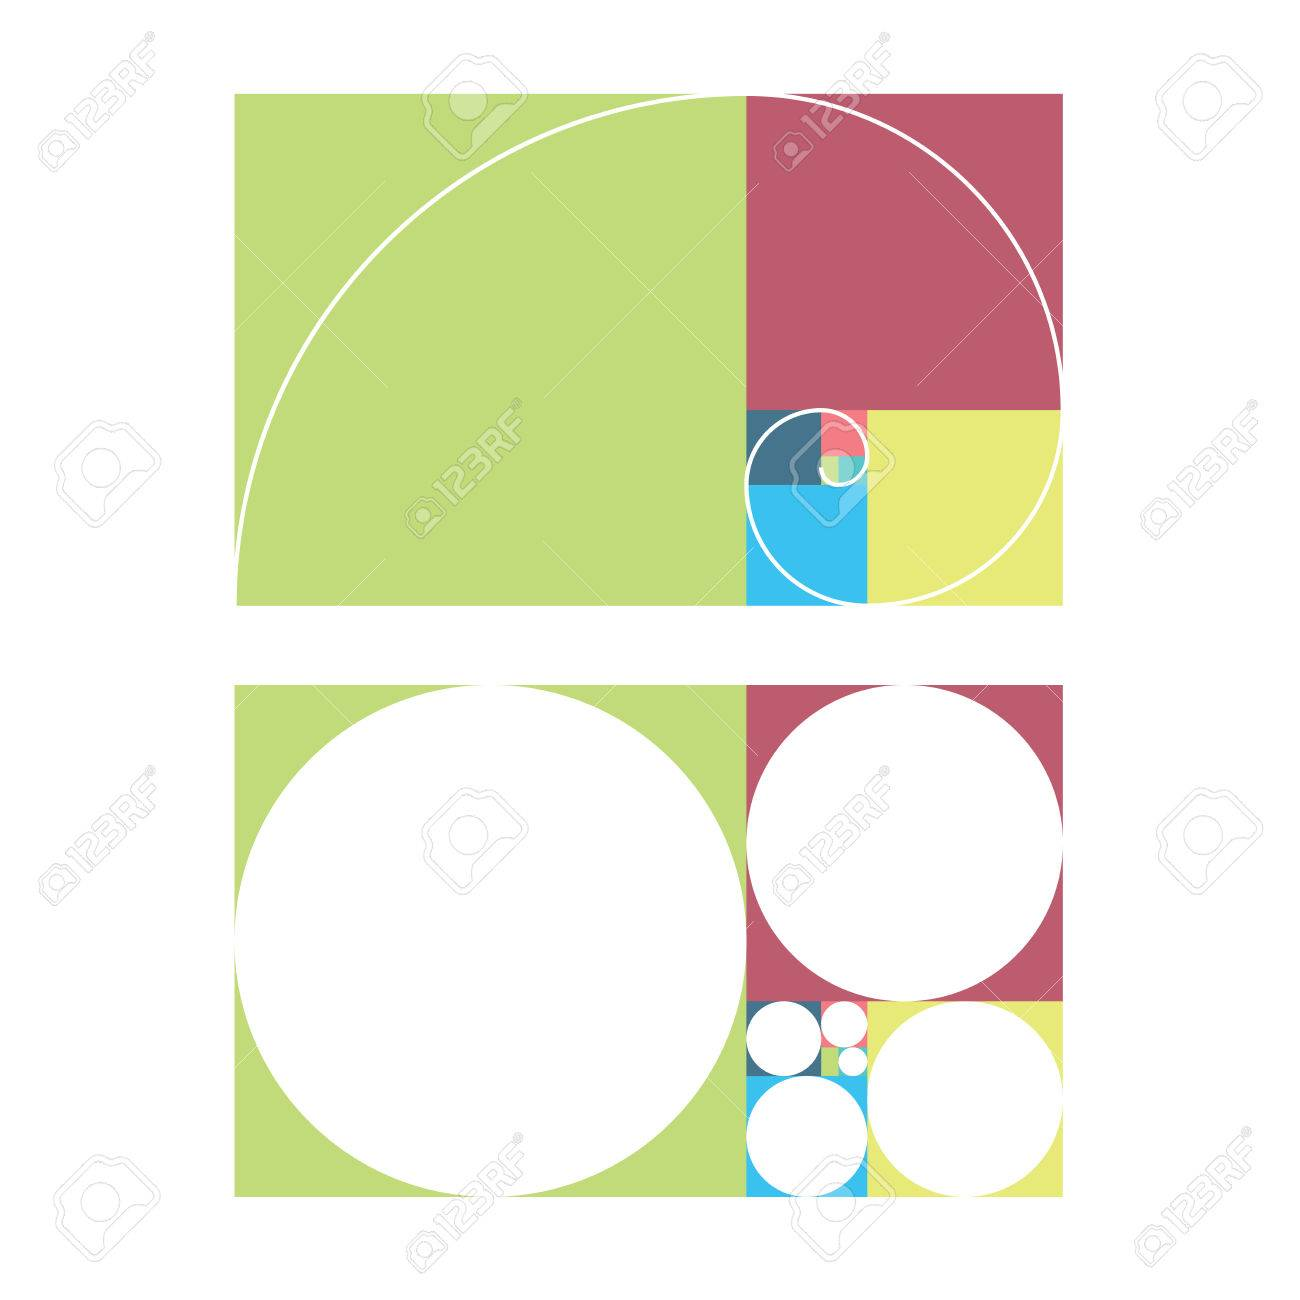 golden ratio template vector illustration fibonacci royalty free